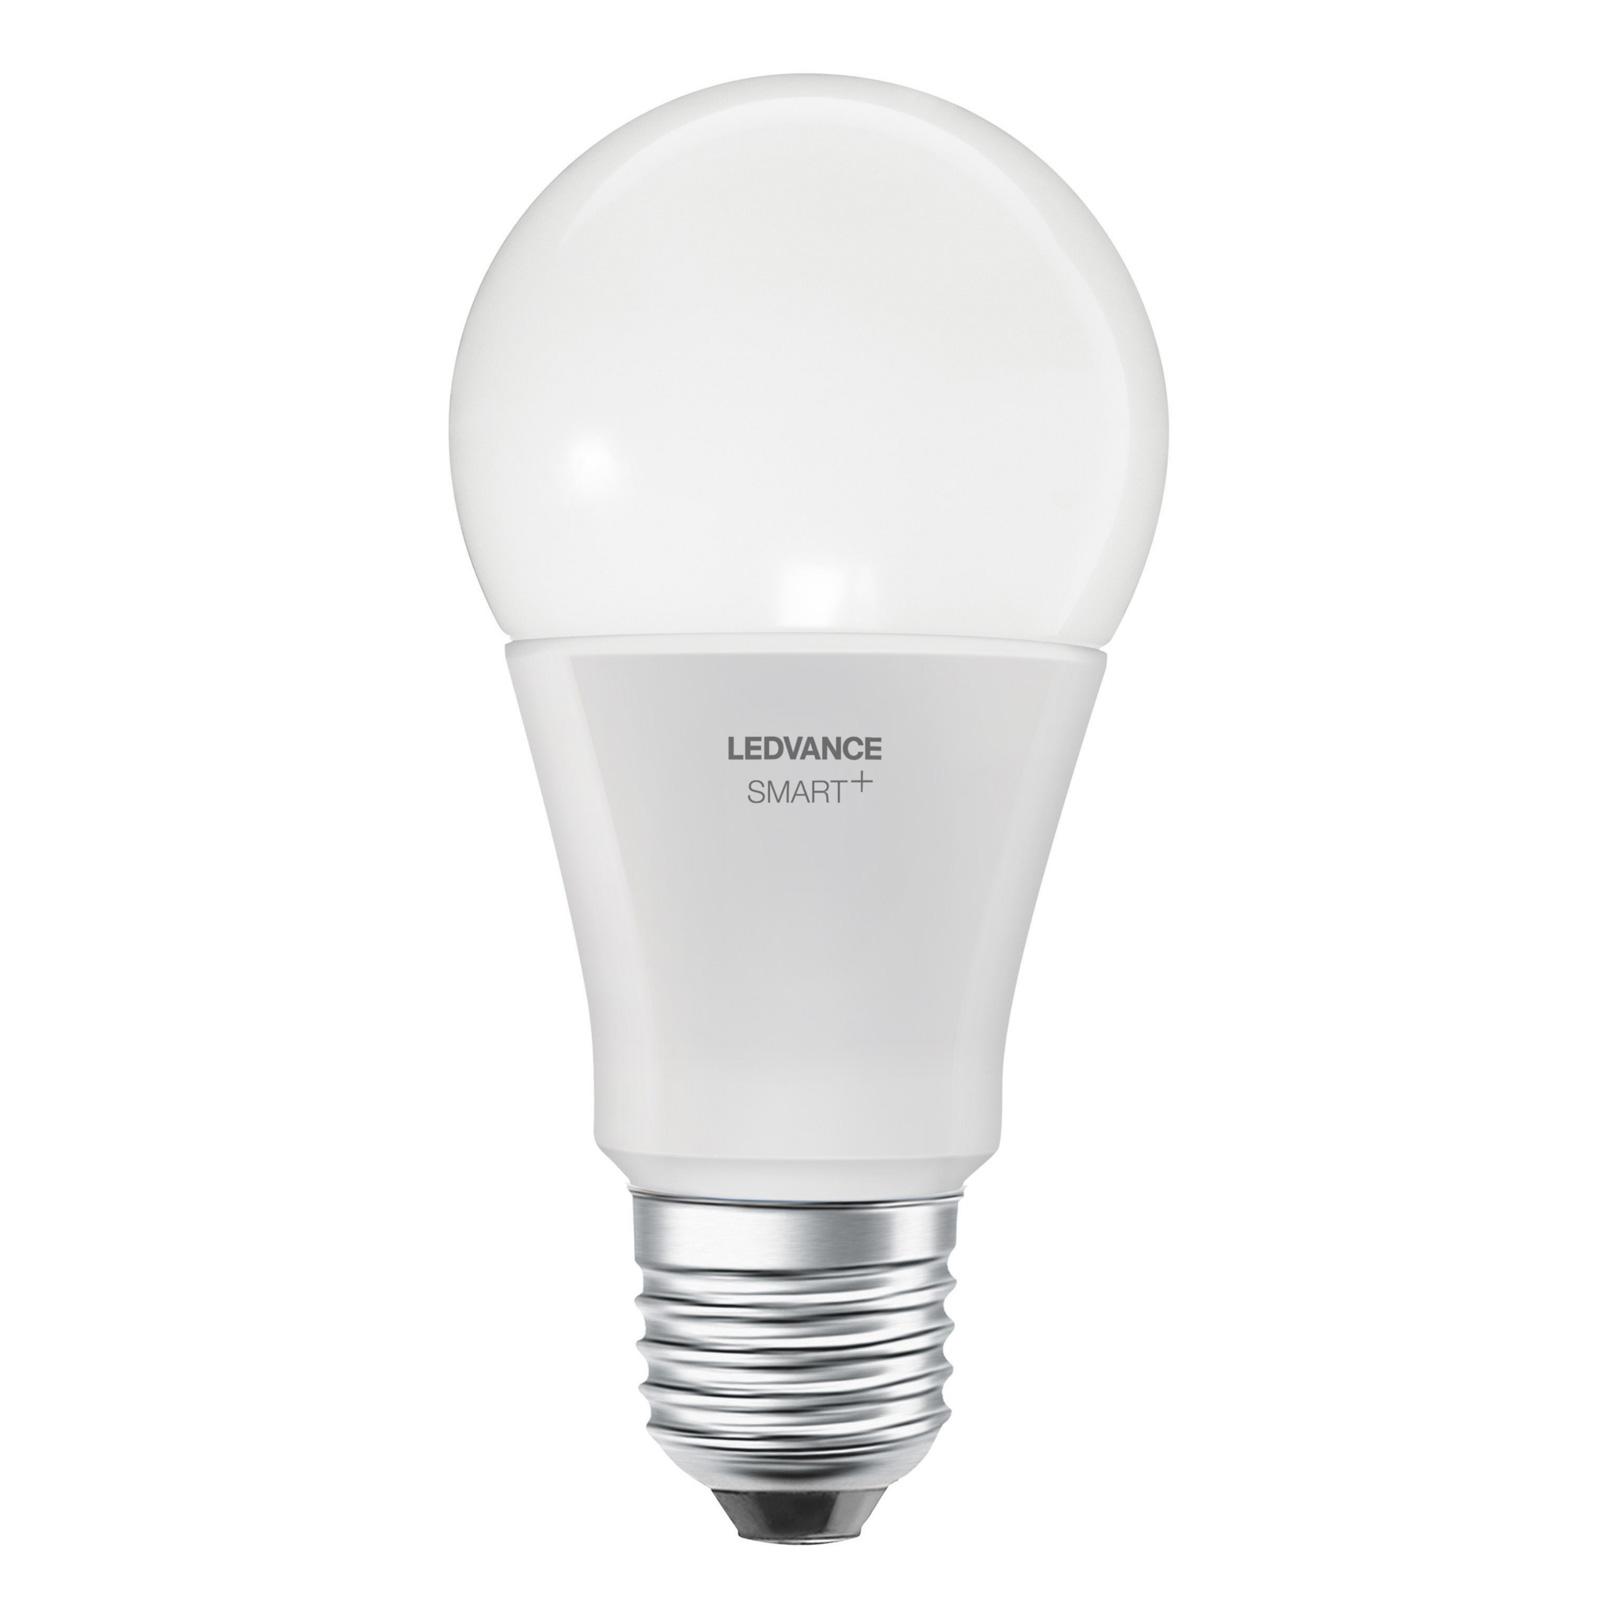 LEDVANCE SMART+ ZigBee E27 8,5W Classic 2.700K